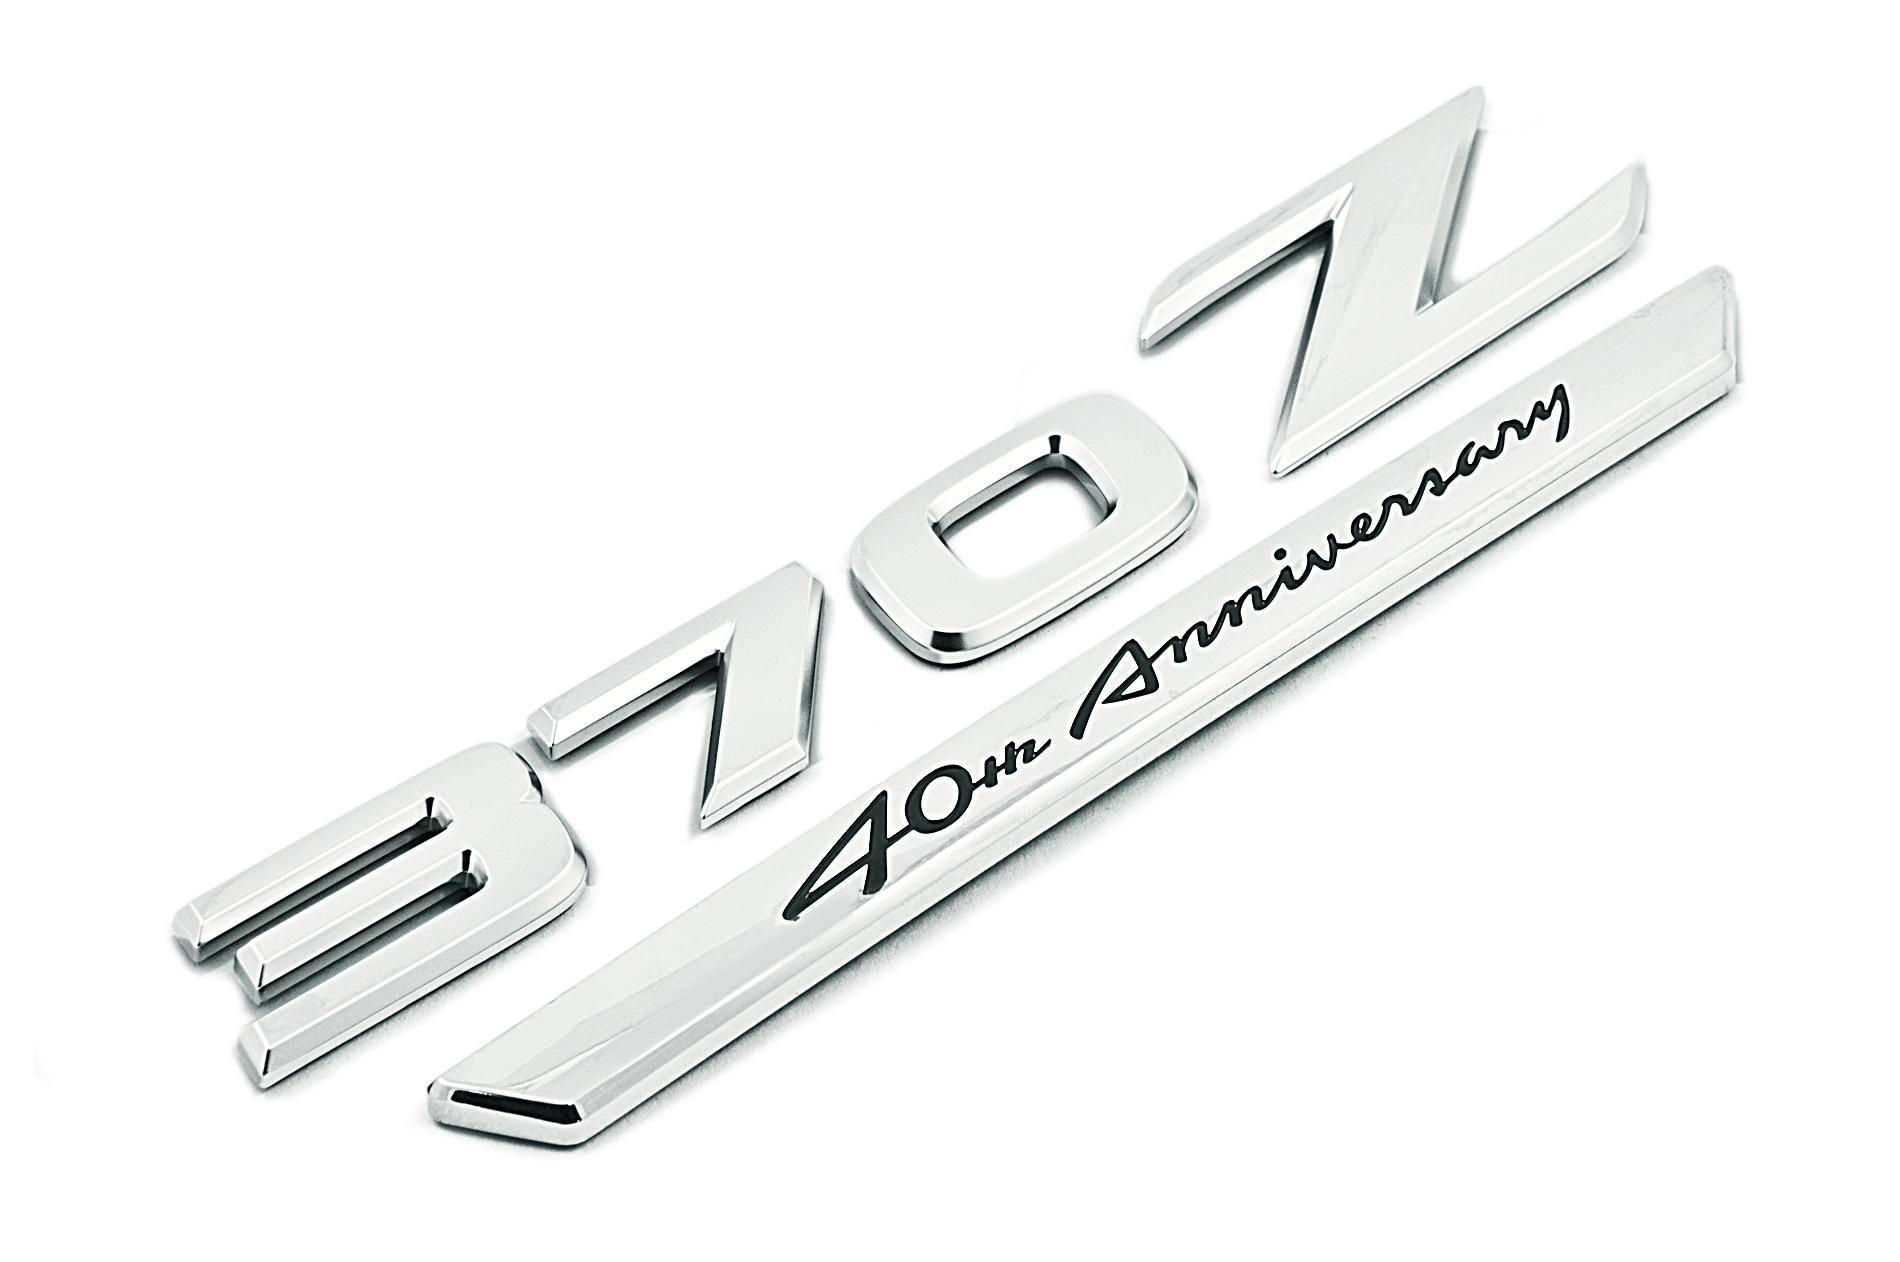 Nissan Genuine 370z 40th Anniversary Badge Emblem Rear